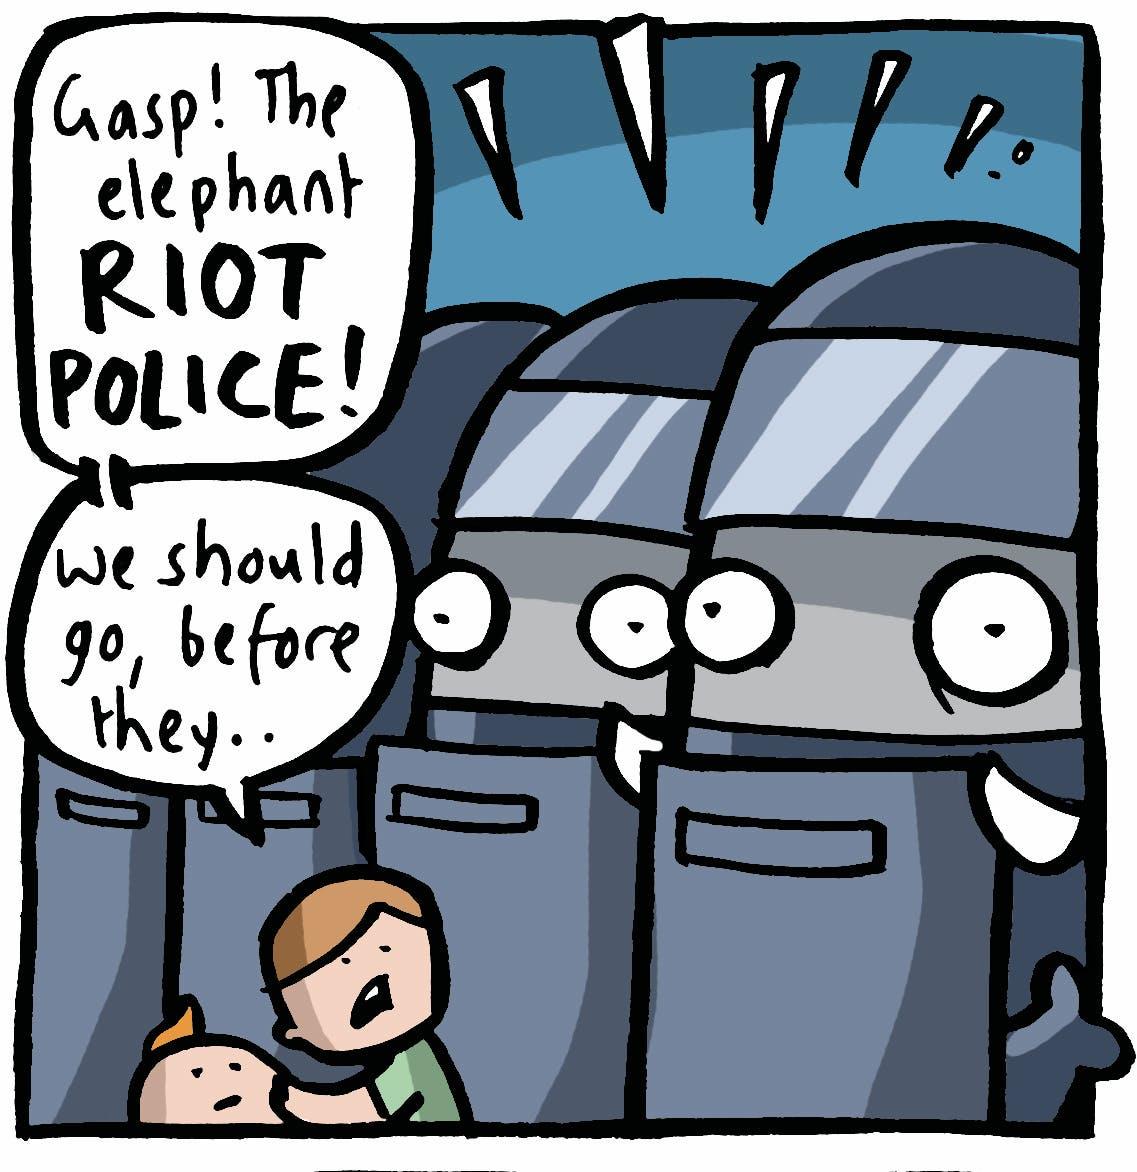 Elephant riot police?